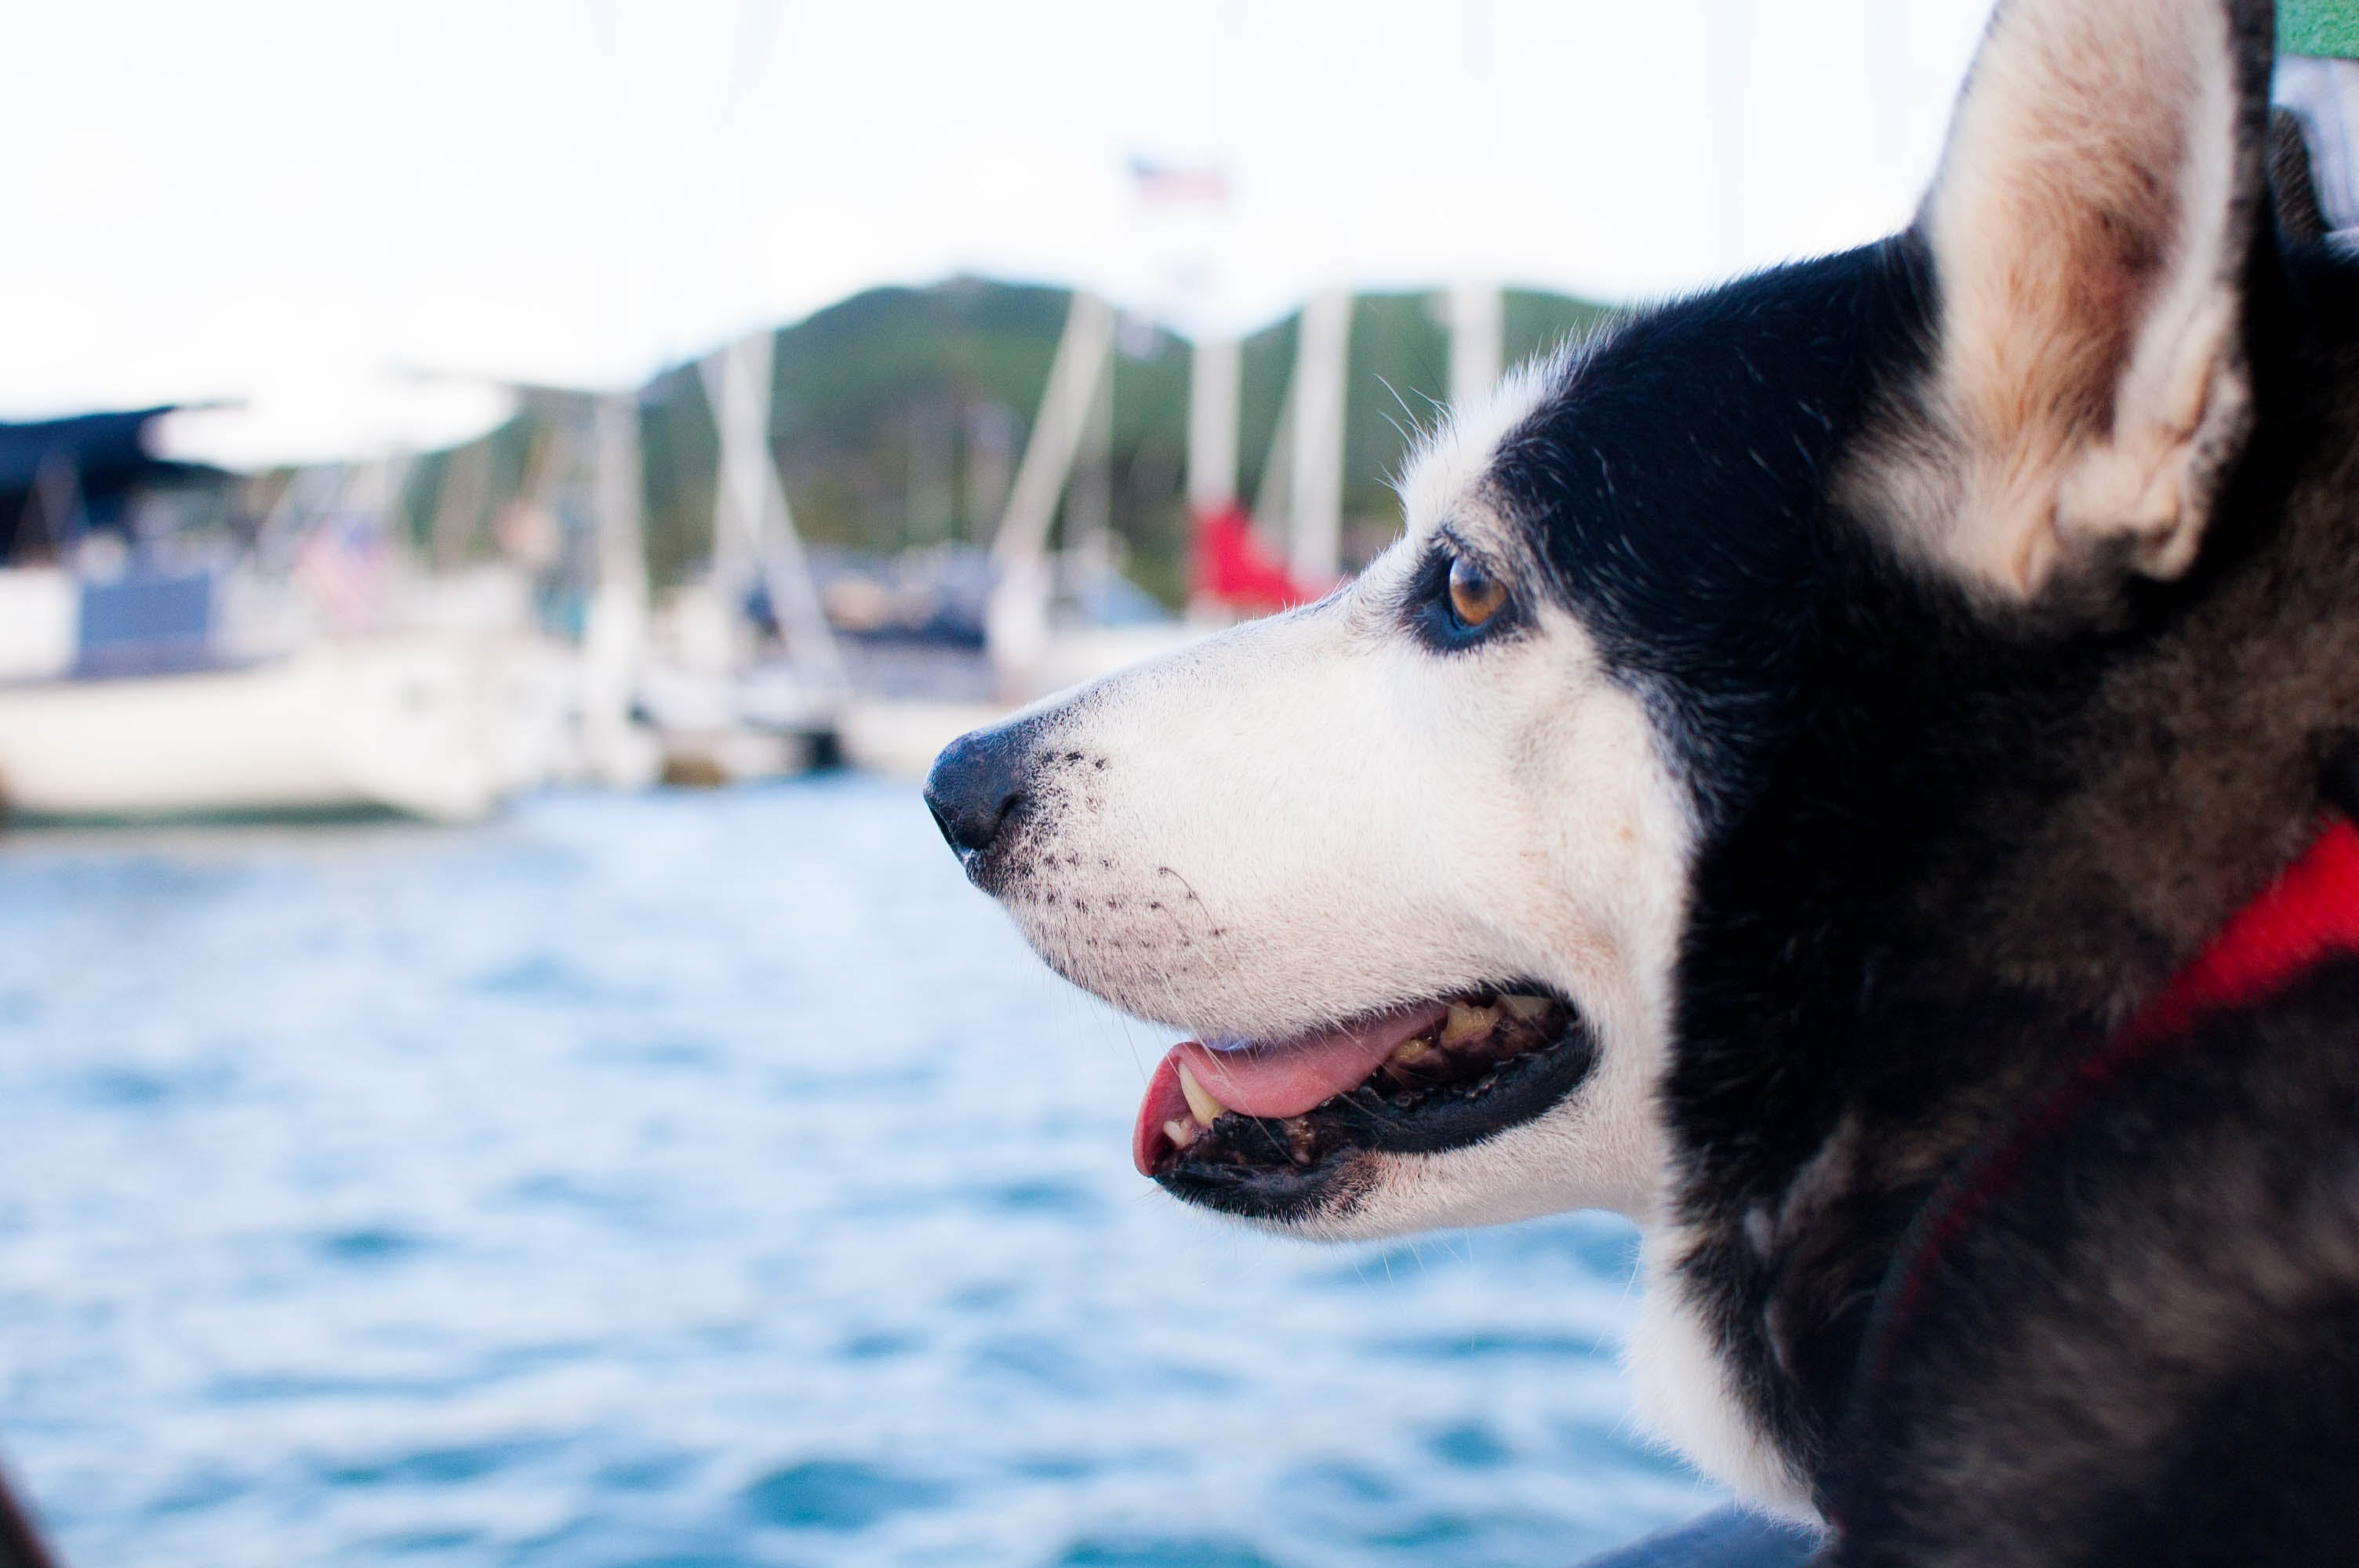 Siberian Husky Near Ocean at Daytime